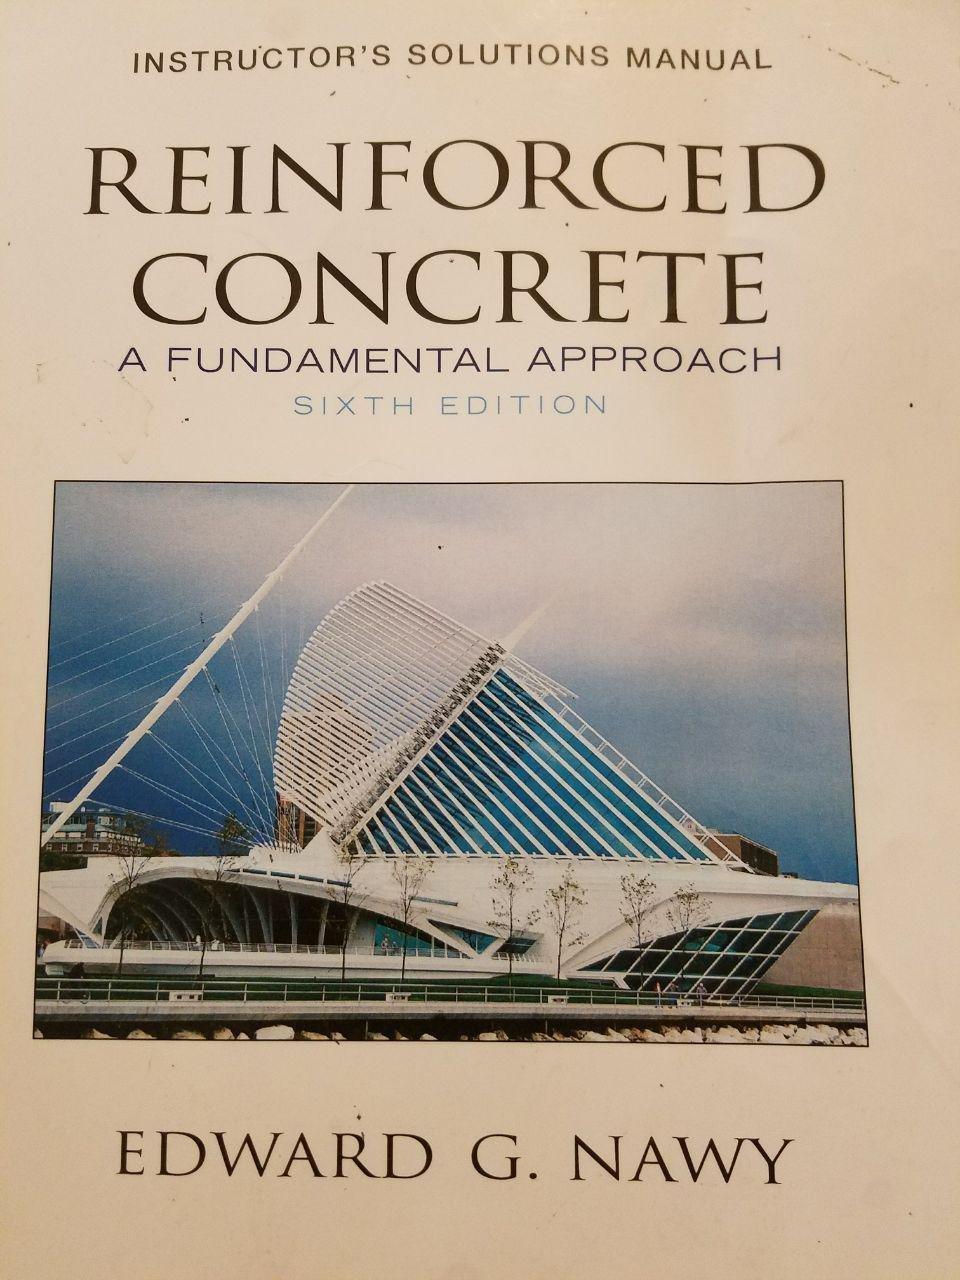 Instructors Solutions Manual for Reinforced Concrete: A Fundamental  Approach, 6/E: Edward G. Nawy: 9780132417020: Amazon.com: Books